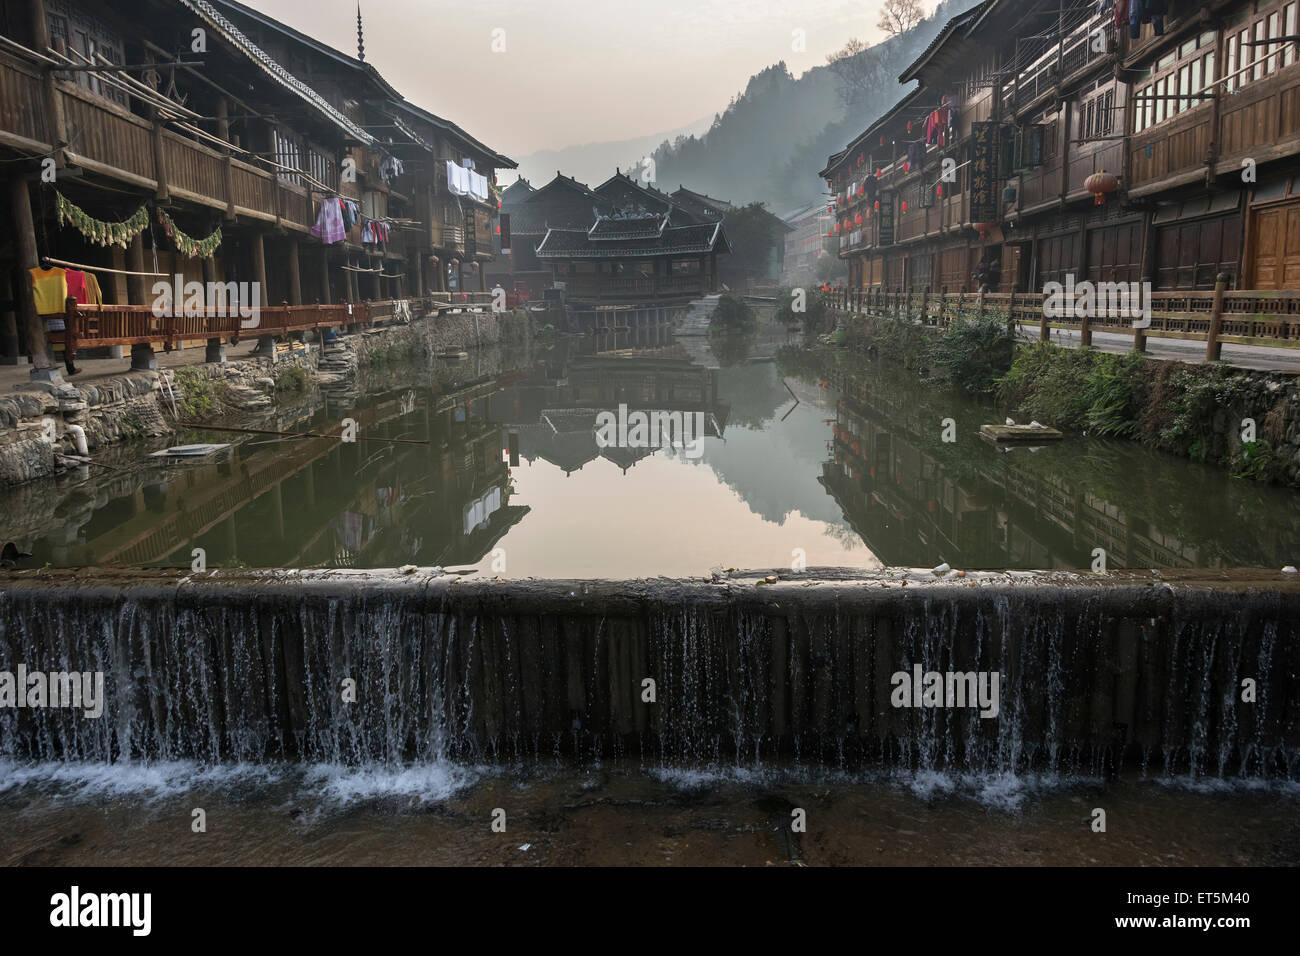 Dong houses on the Nanjiang river, Zhaoxing Dong Village, Guizhou Province, China Stock Photo